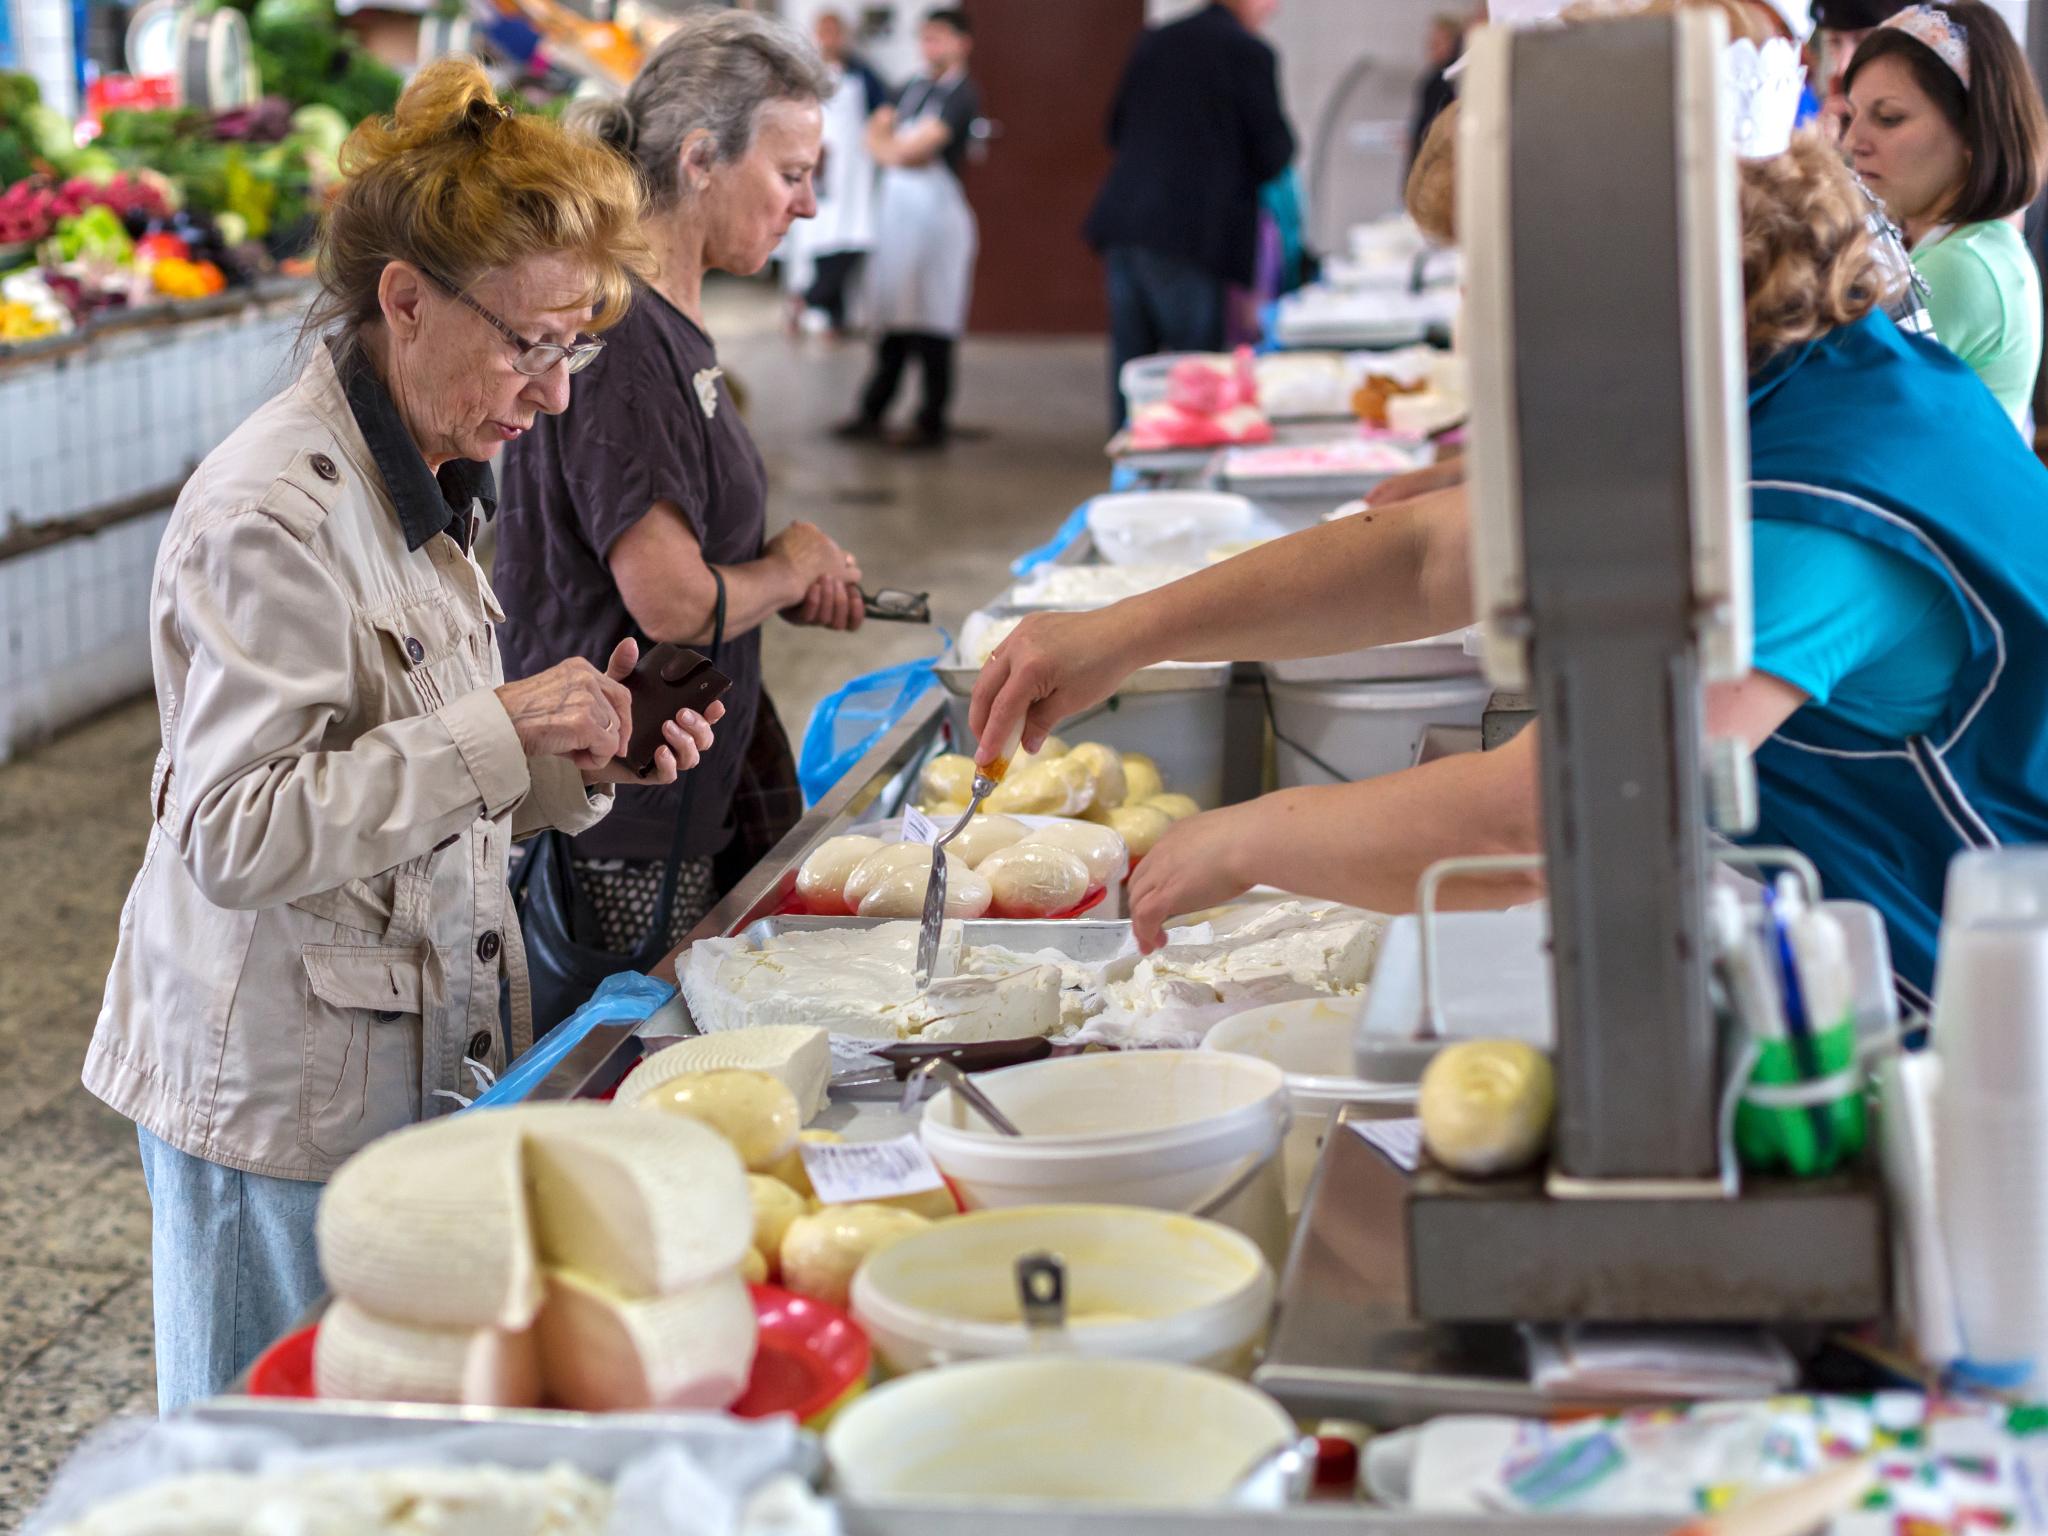 Kuznechny rynok - market, St. Petersburg